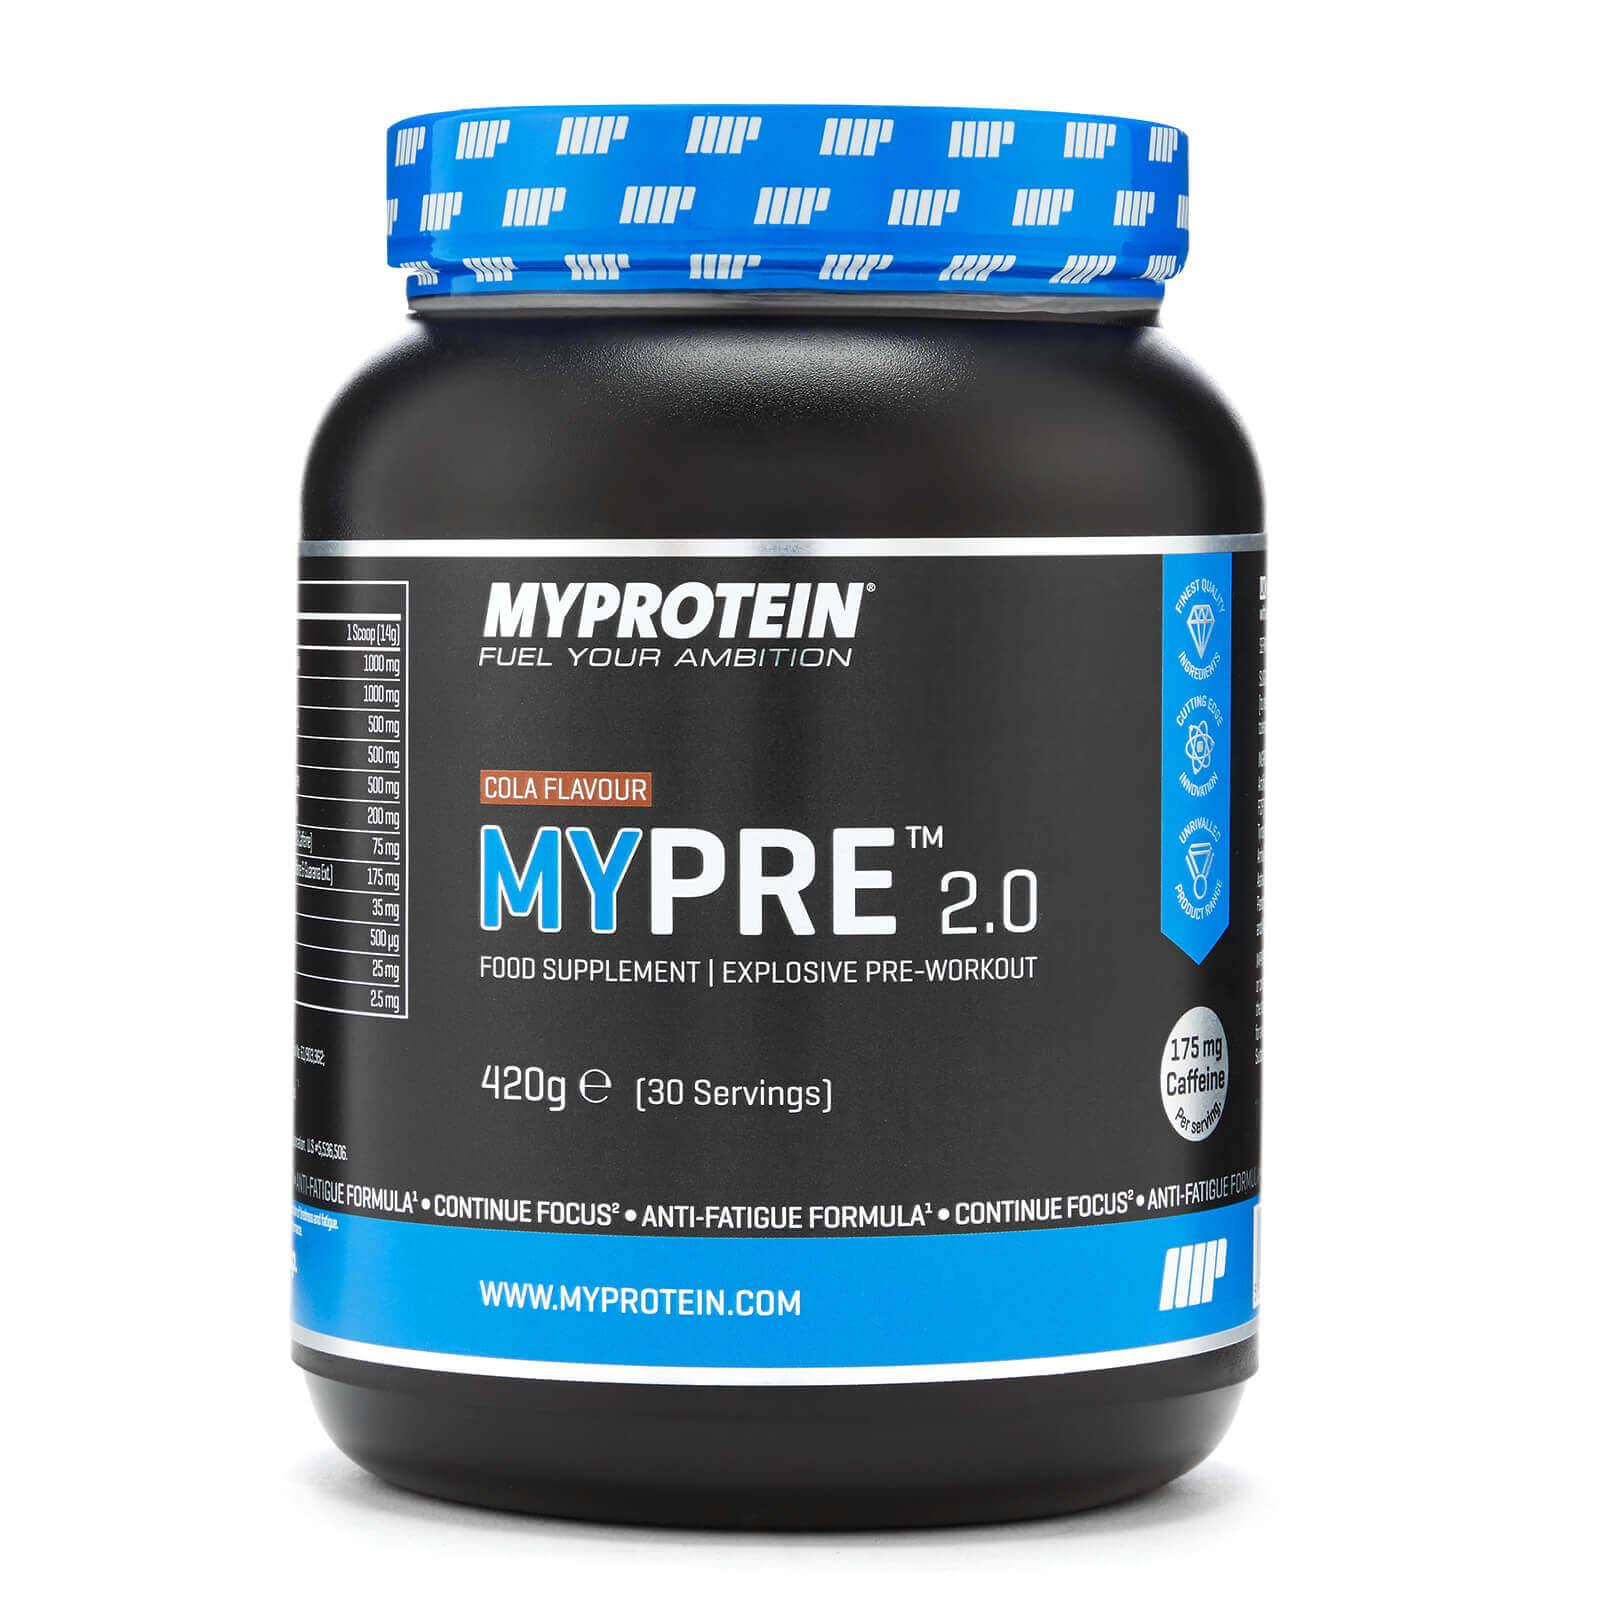 Mypre™ 2.0